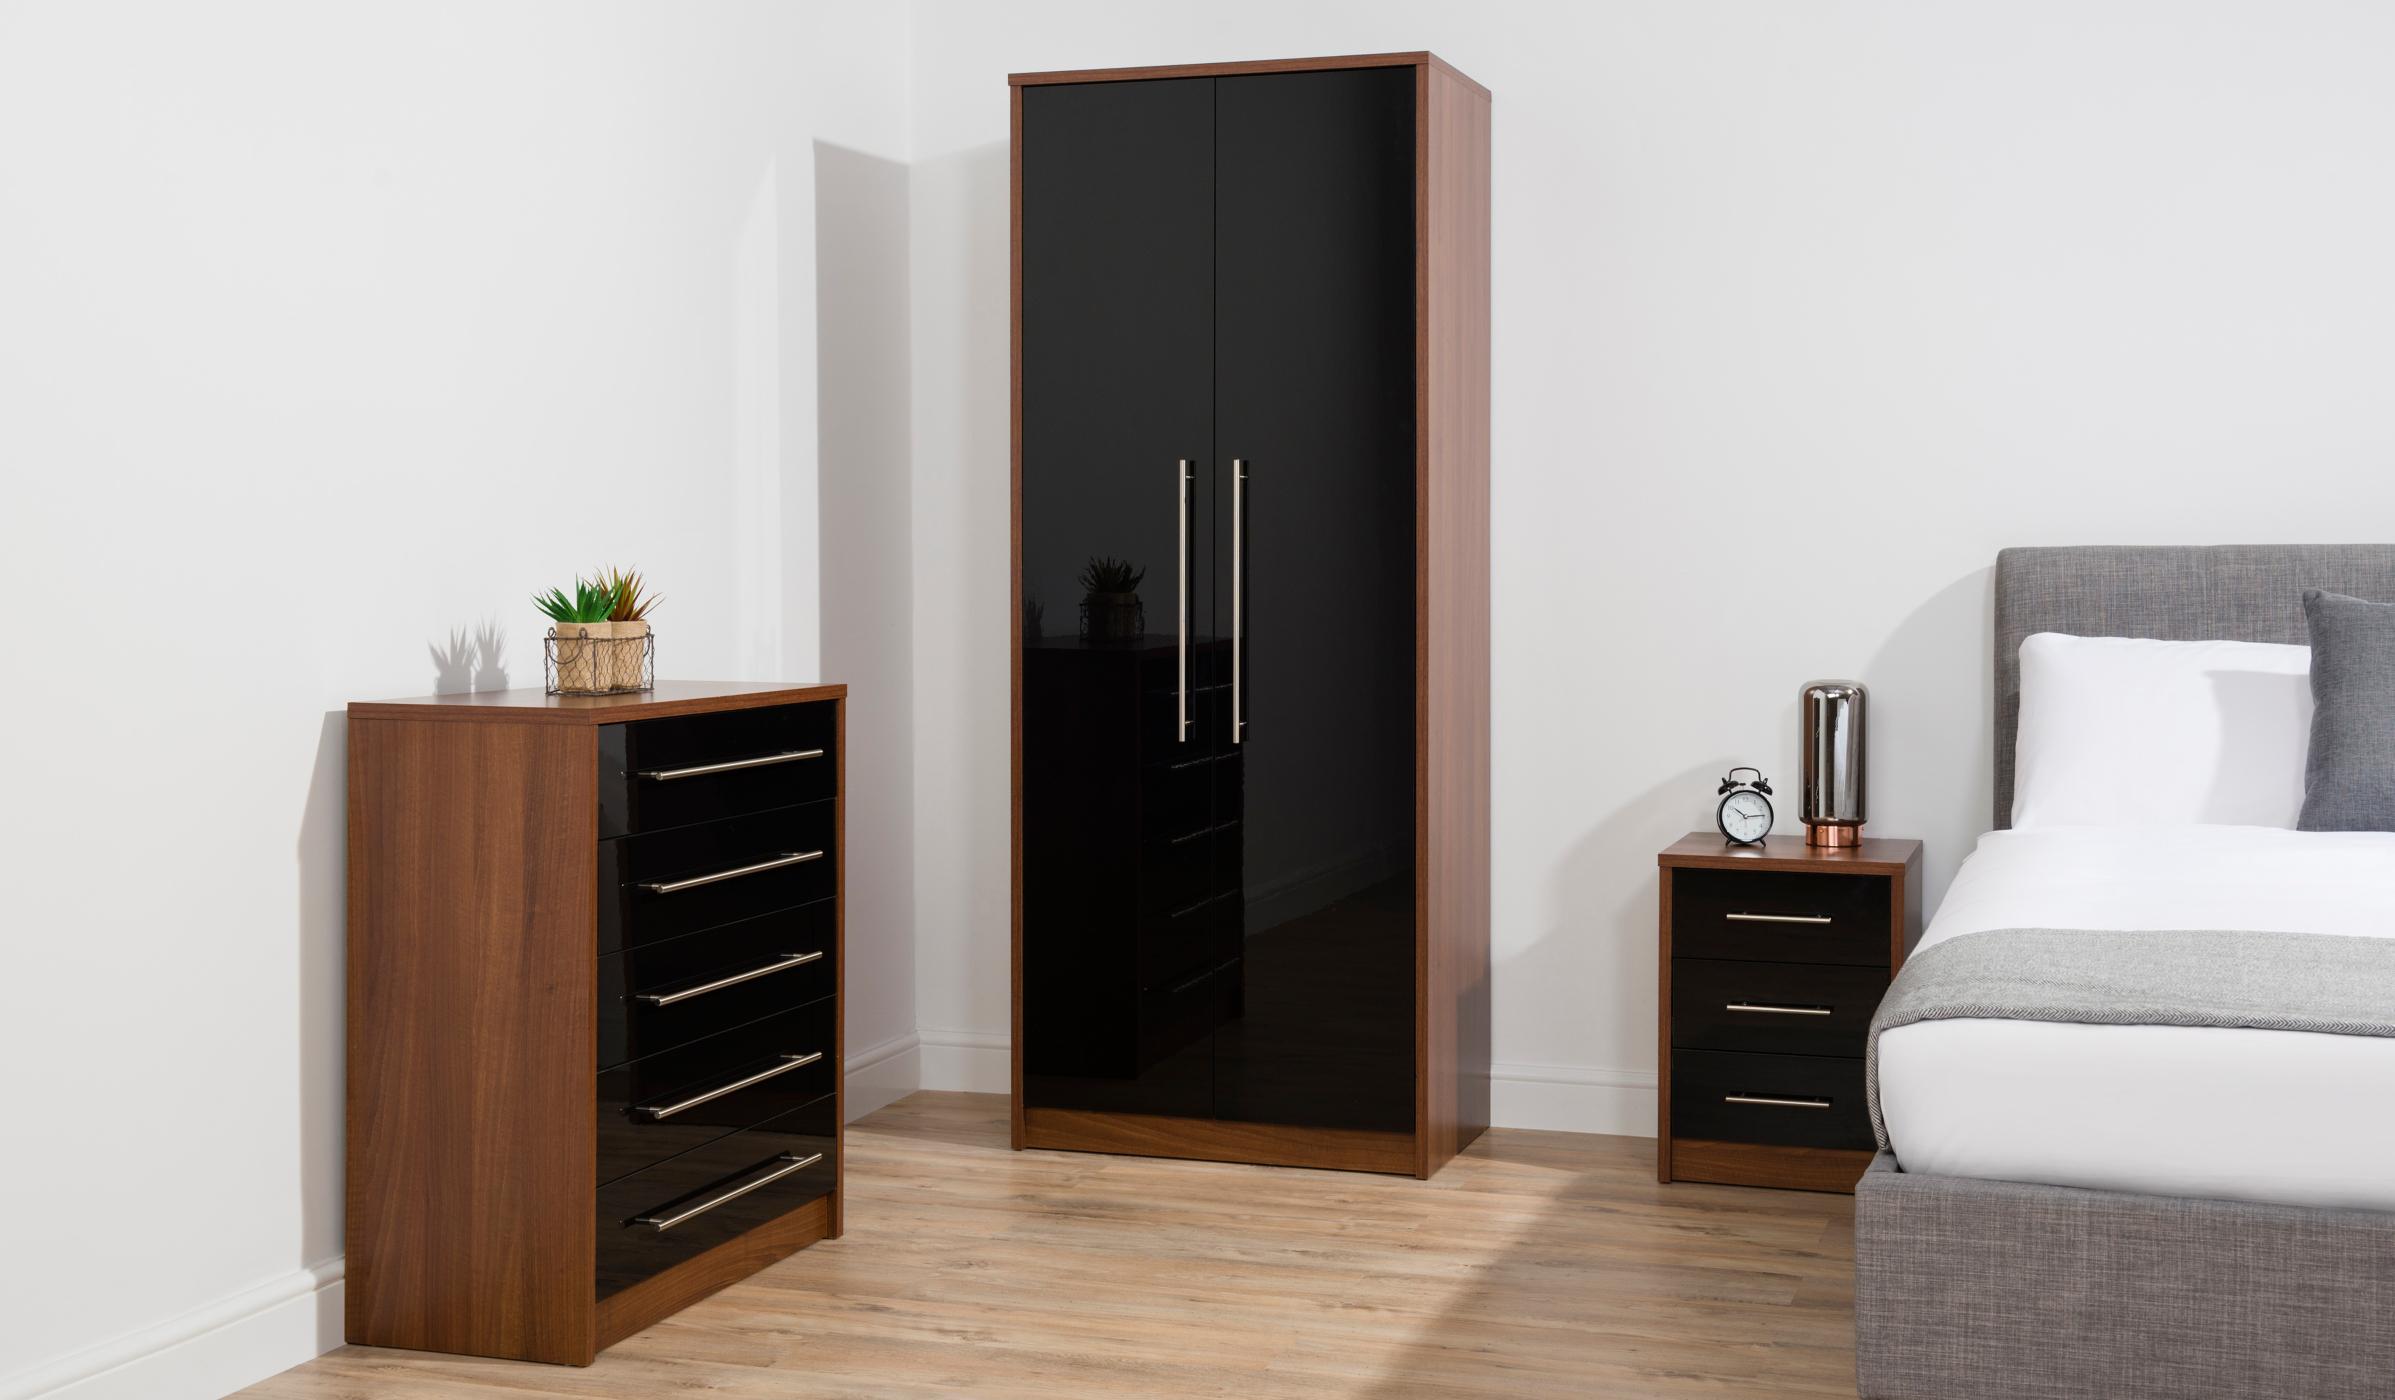 Walnut Bedroom Furniture Uk george home donahue bedroom furniture range - walnut effect and